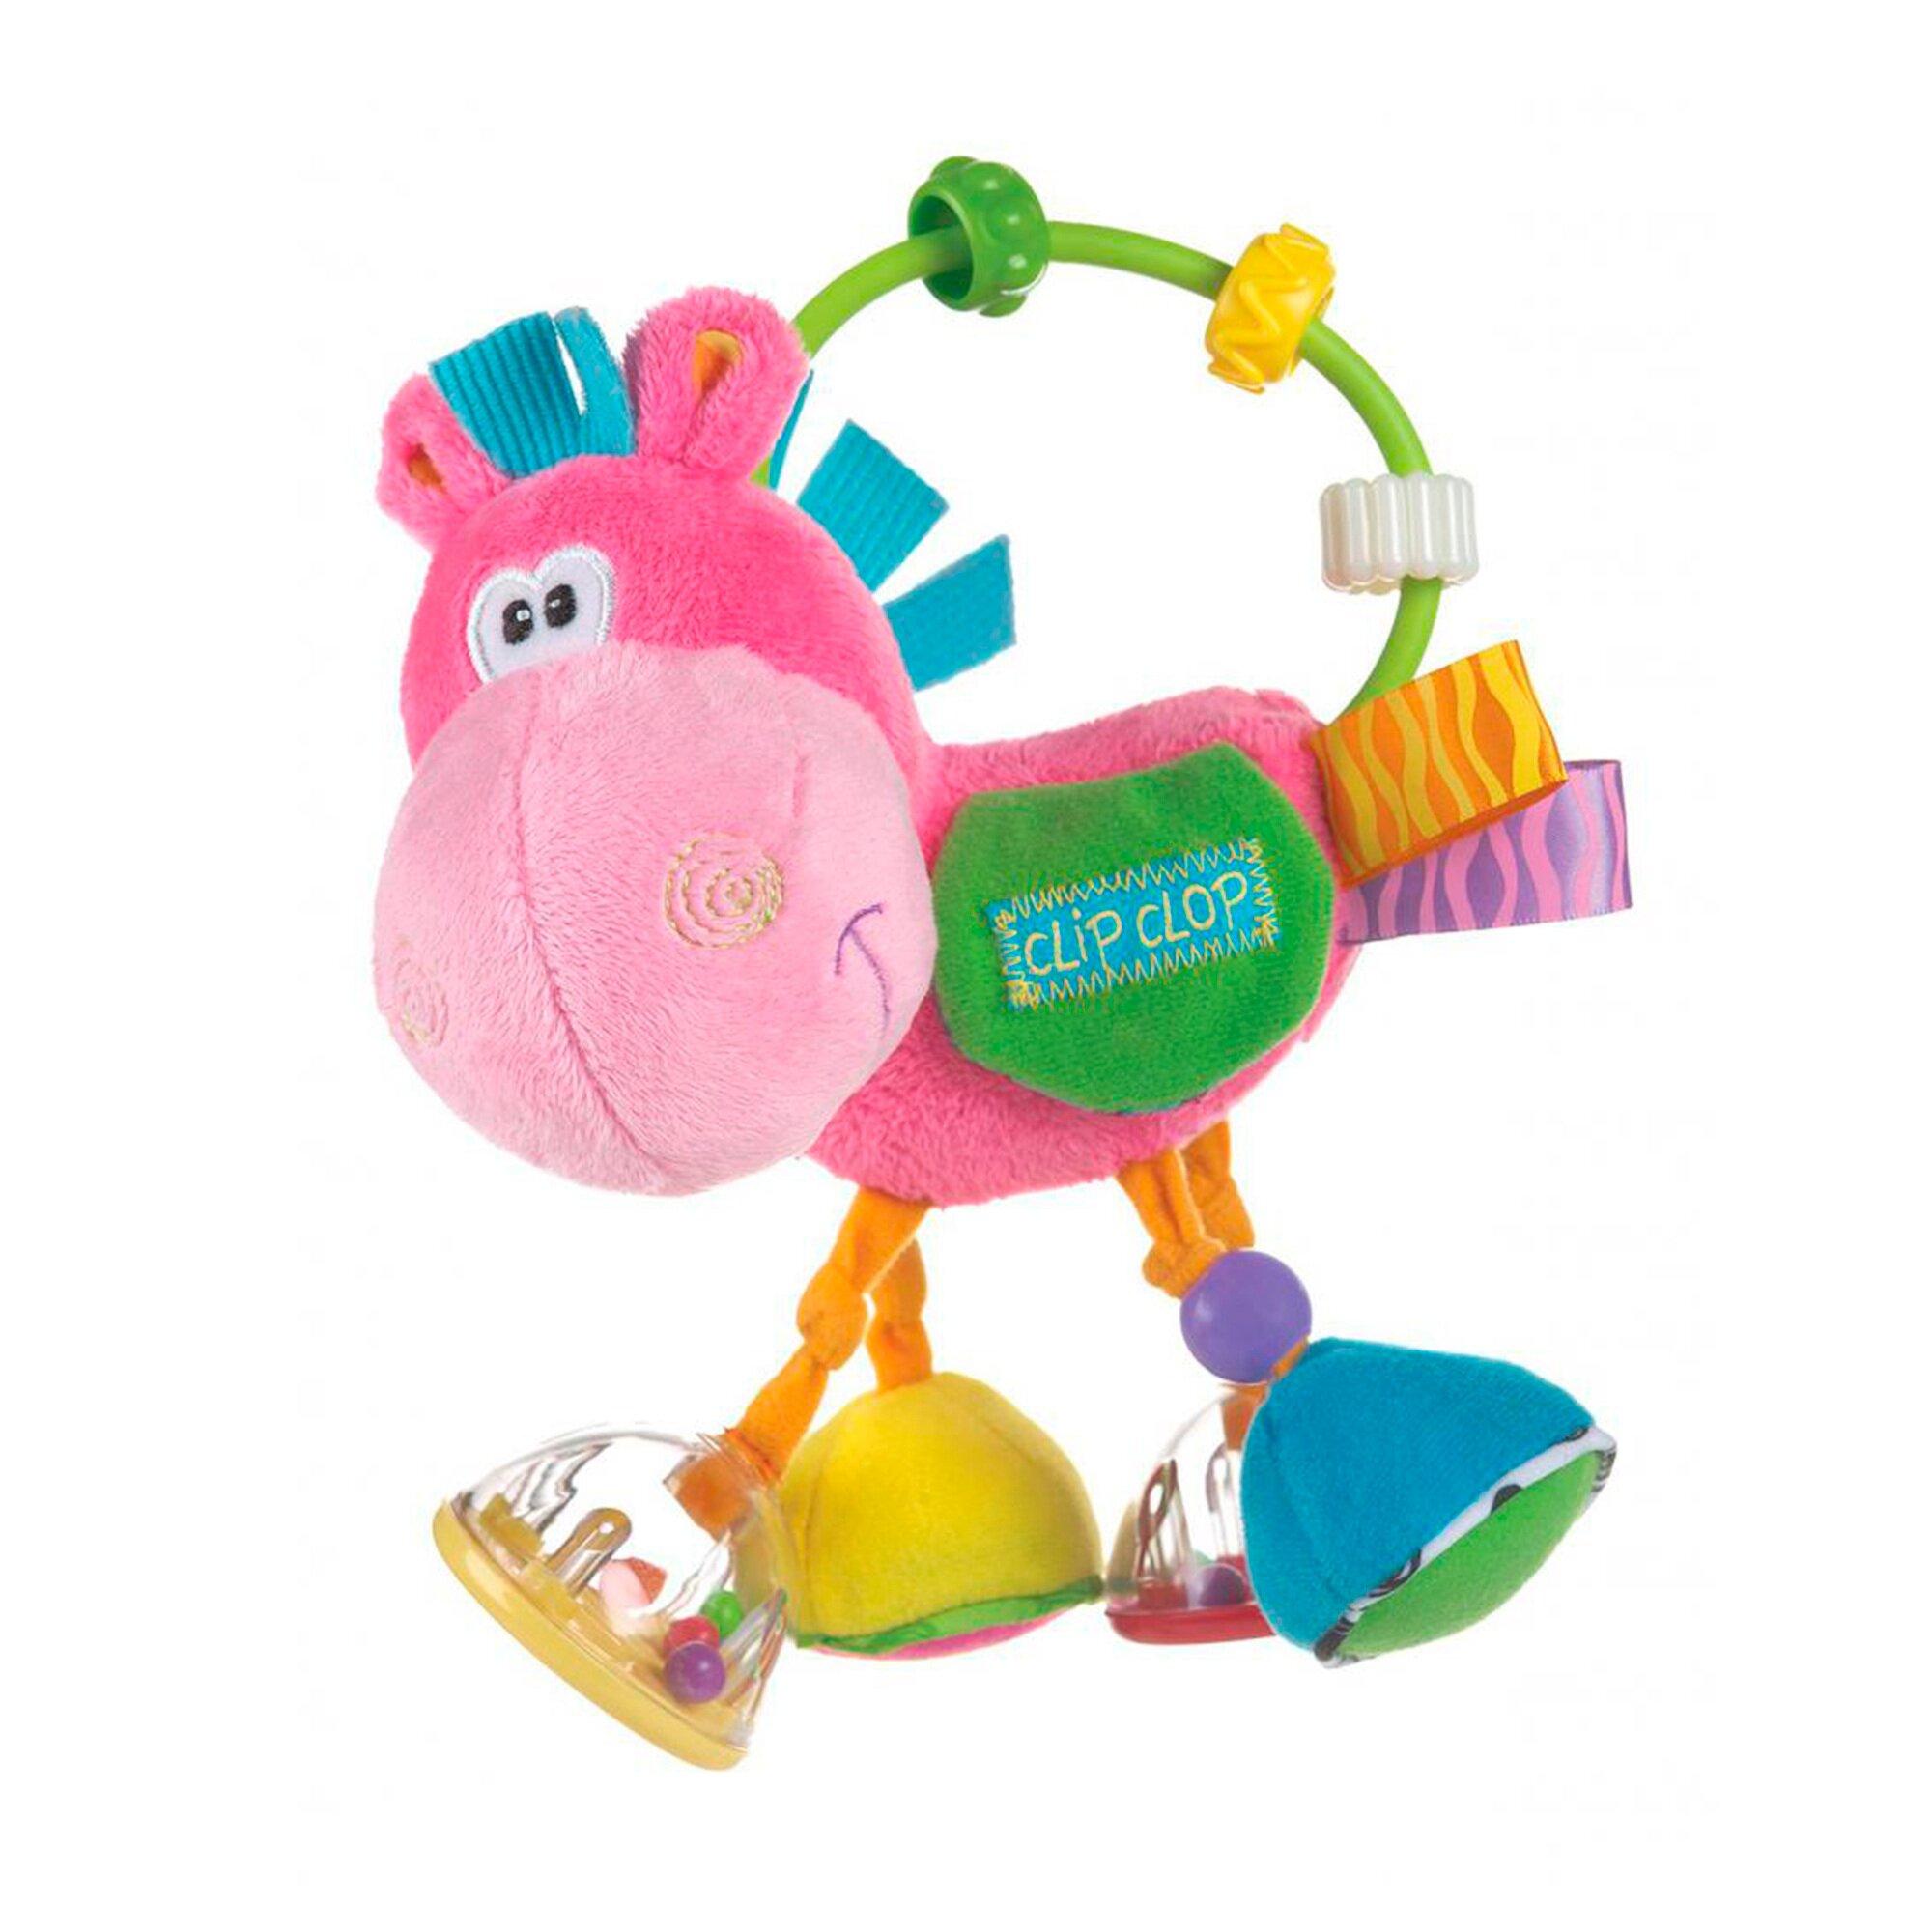 Playgro Rassel Pferd Klipp Klapp Toy Box